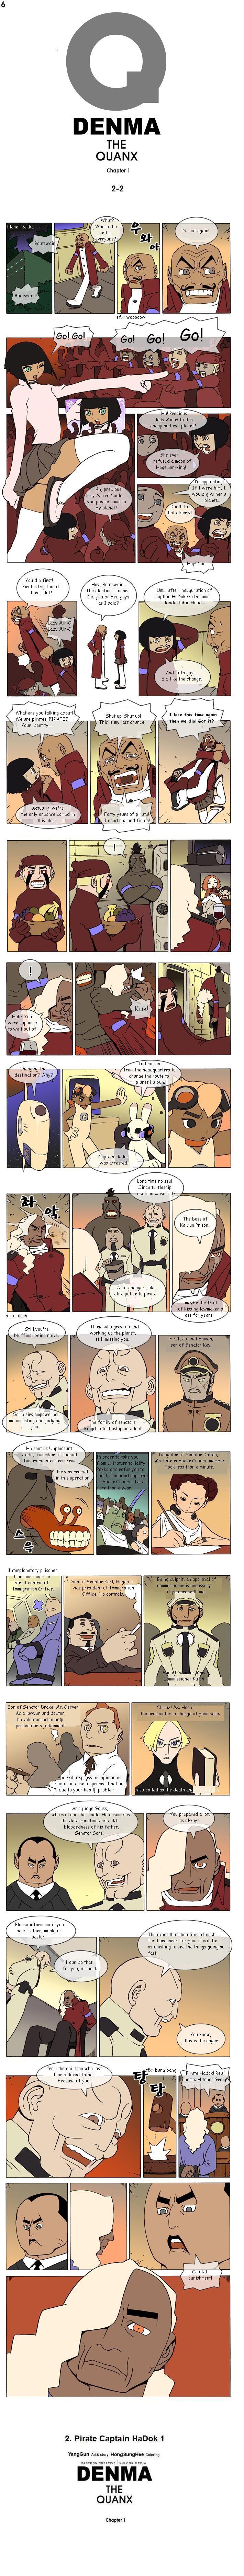 Denma 6 Page 1